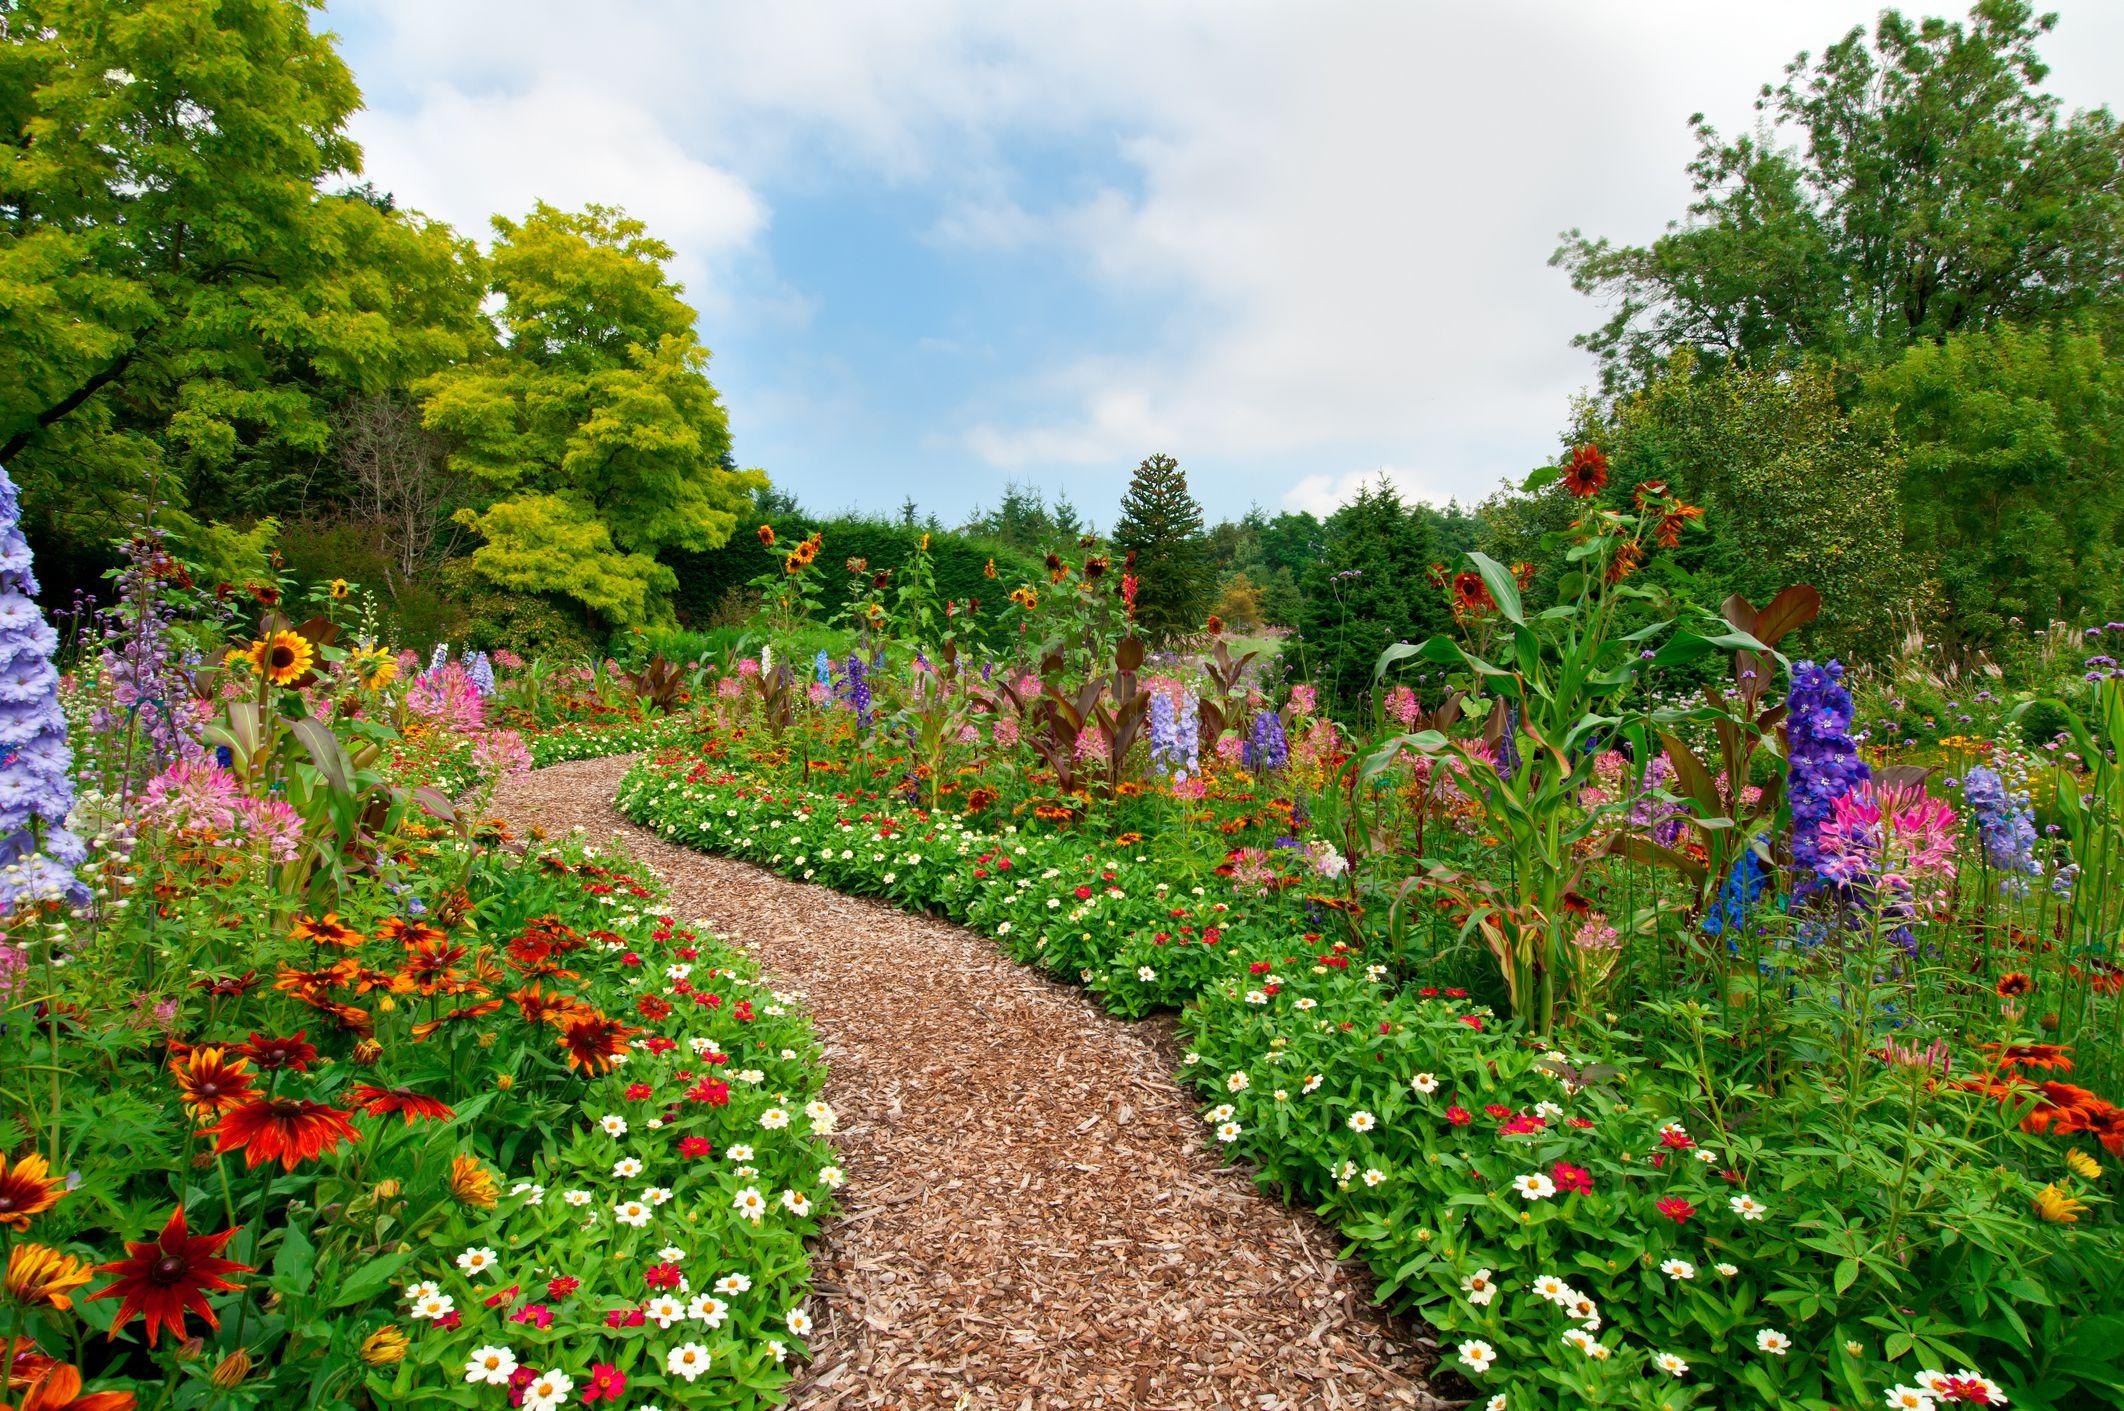 Path through a lush summer flower garden